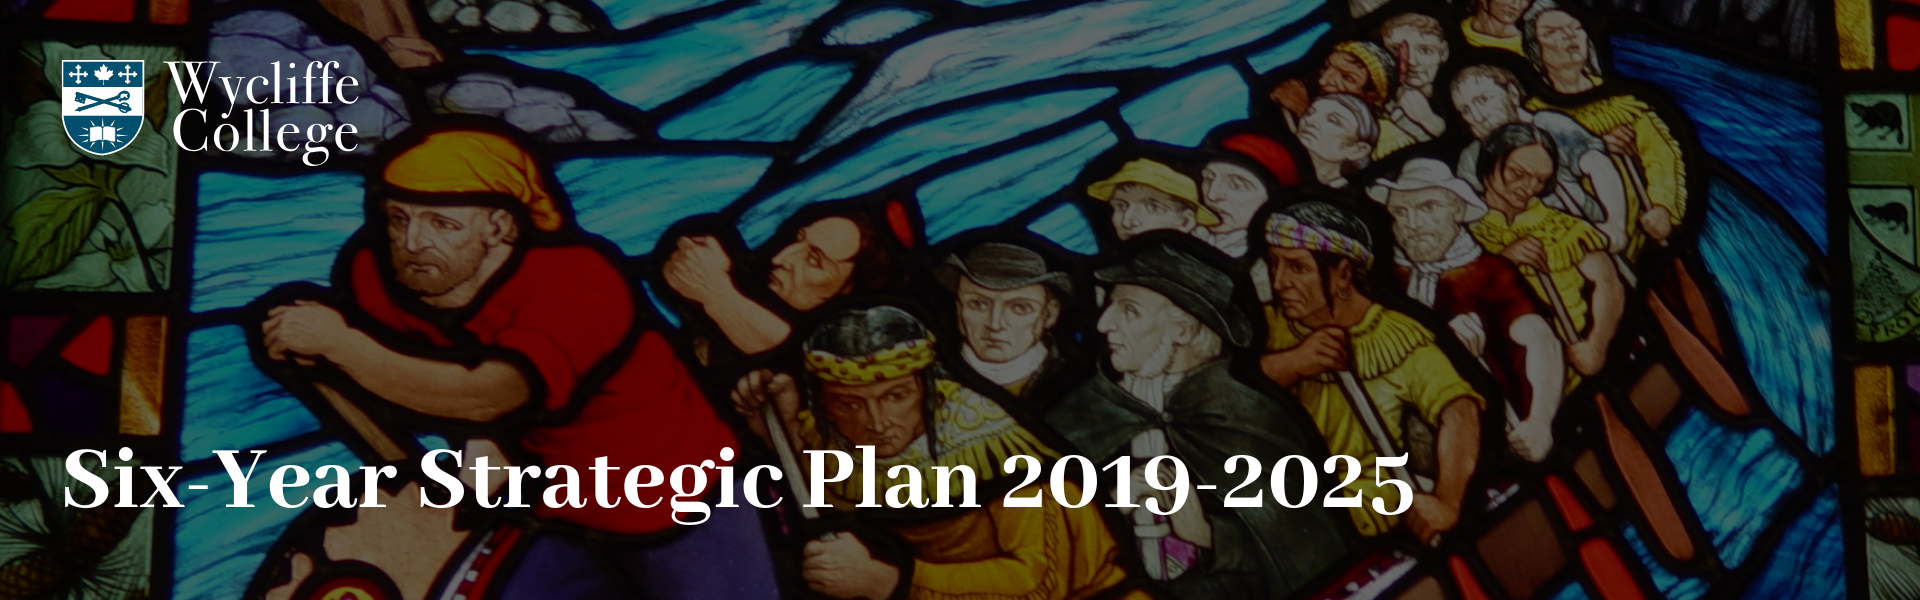 Wycliffe College Strategic Plan 2019-2025